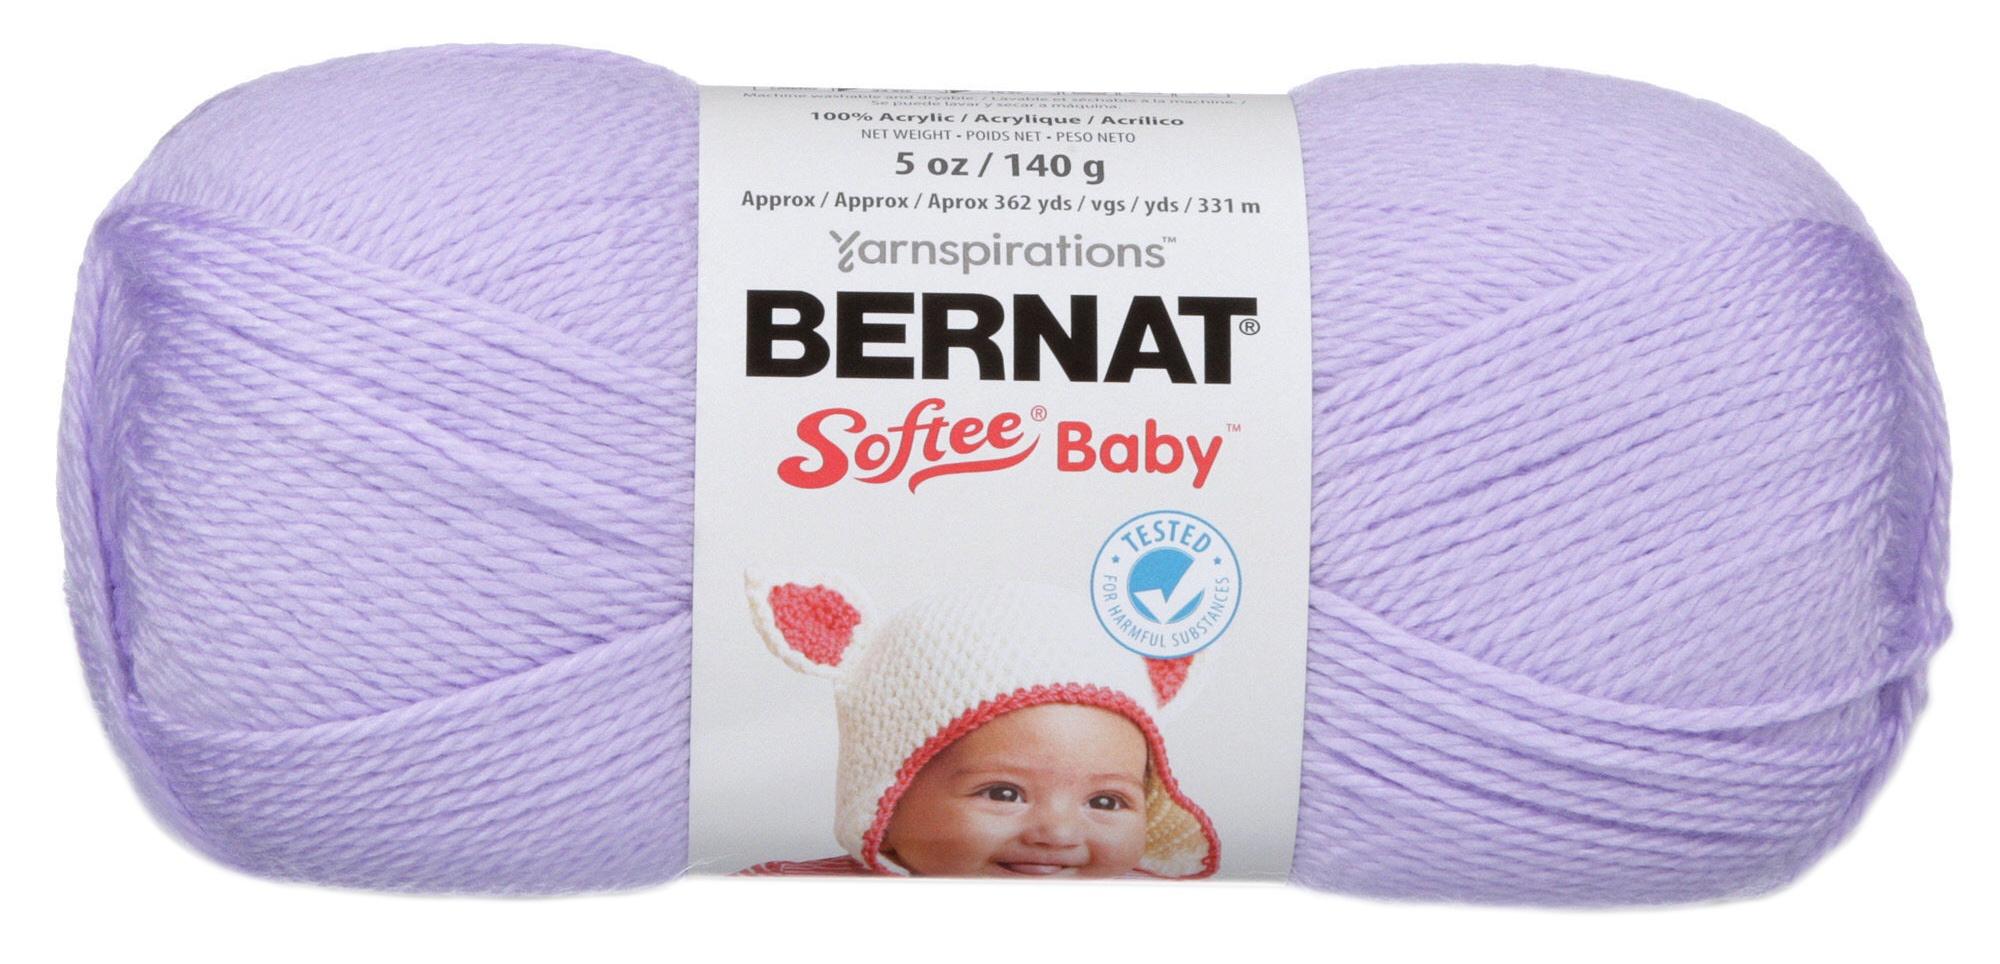 Solids-Soft Lilac 166030-30185 Bernat Softee Baby Yarn